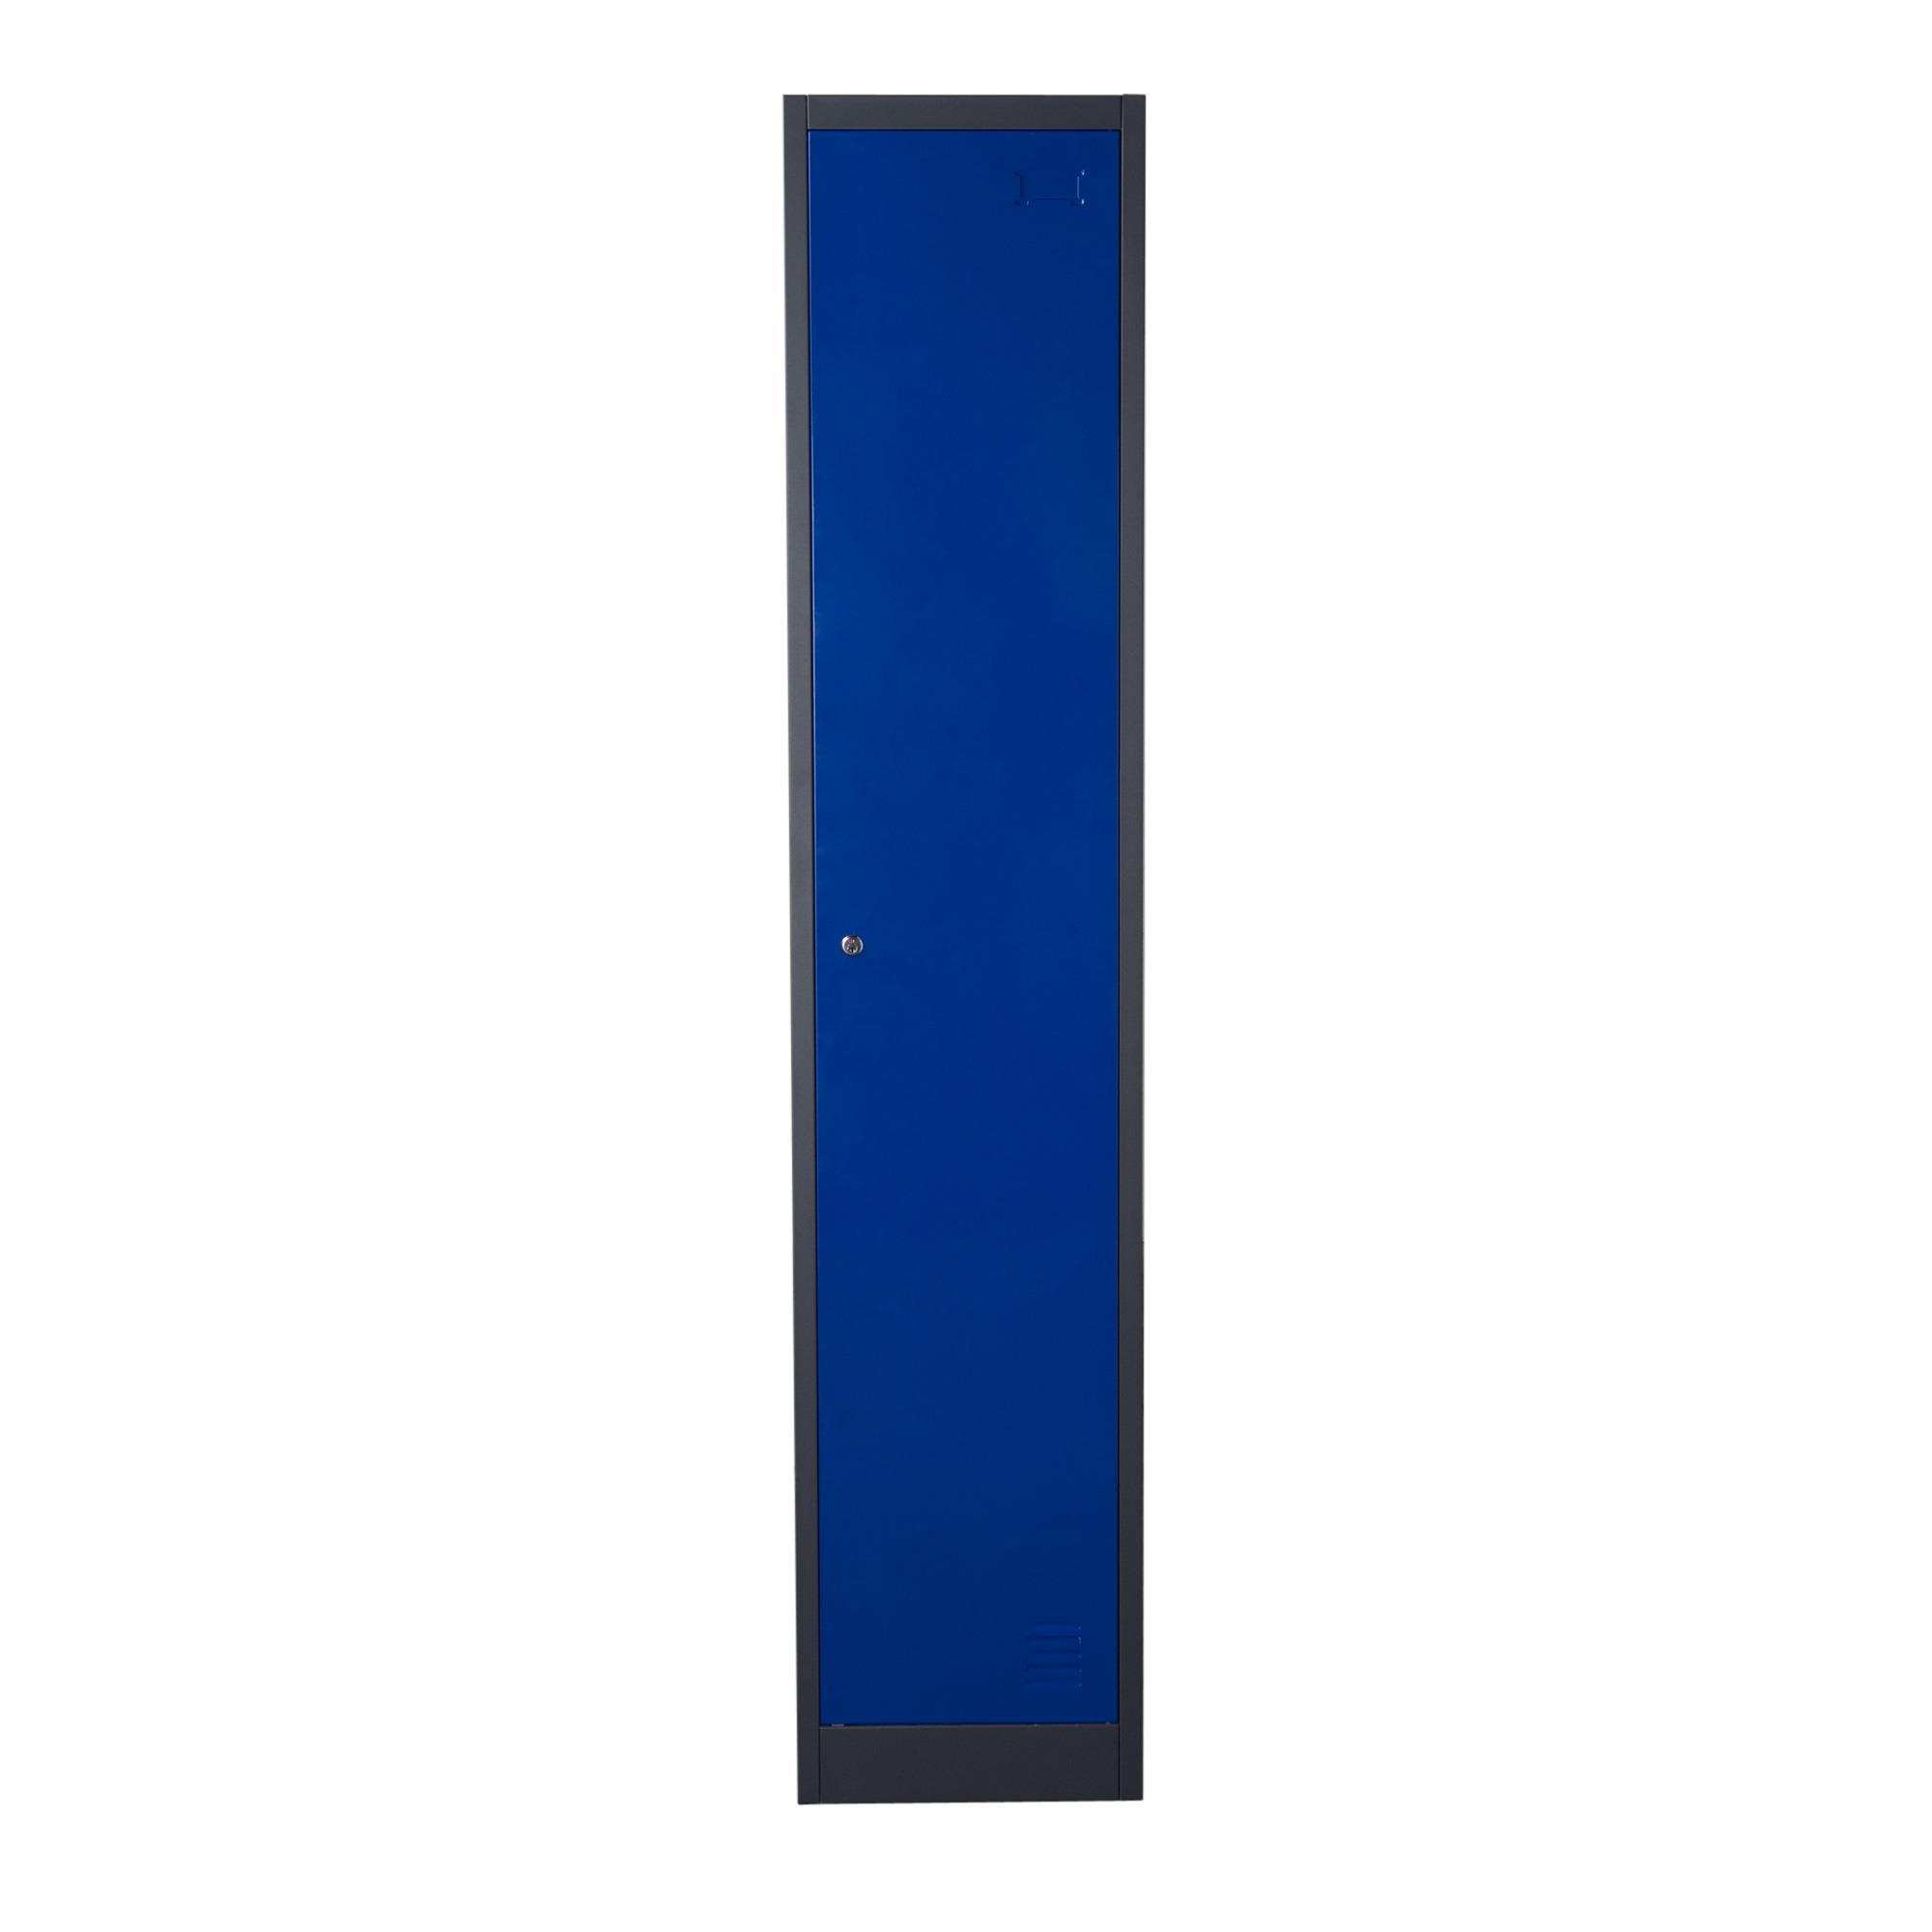 Diamond Sofa NOVA QwiK 1-Door Metal Storage Locker Cabinet - Item Number: LB1BU